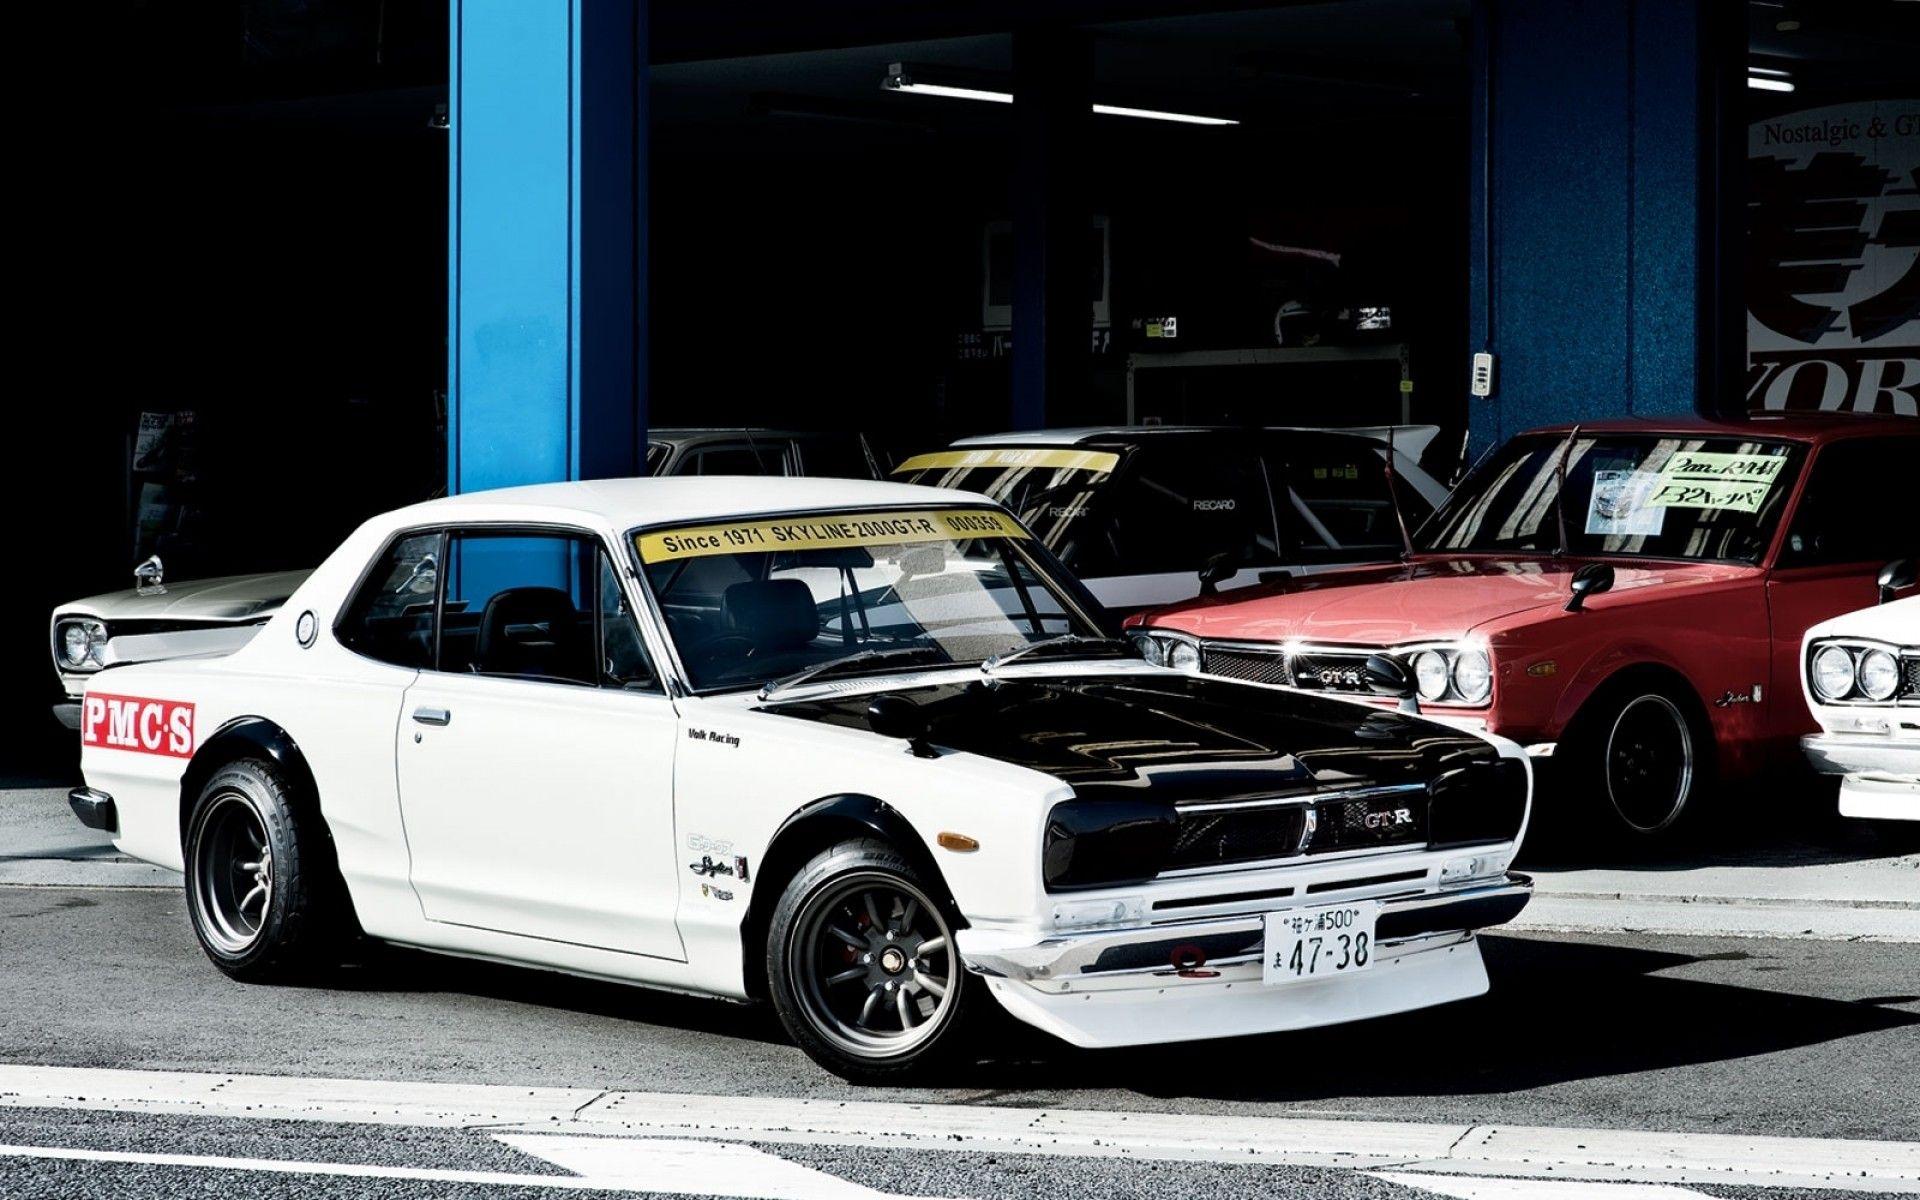 Oldschool Jdm Nissan Skyline Gtr Cars Pinterest Jdm Skyline